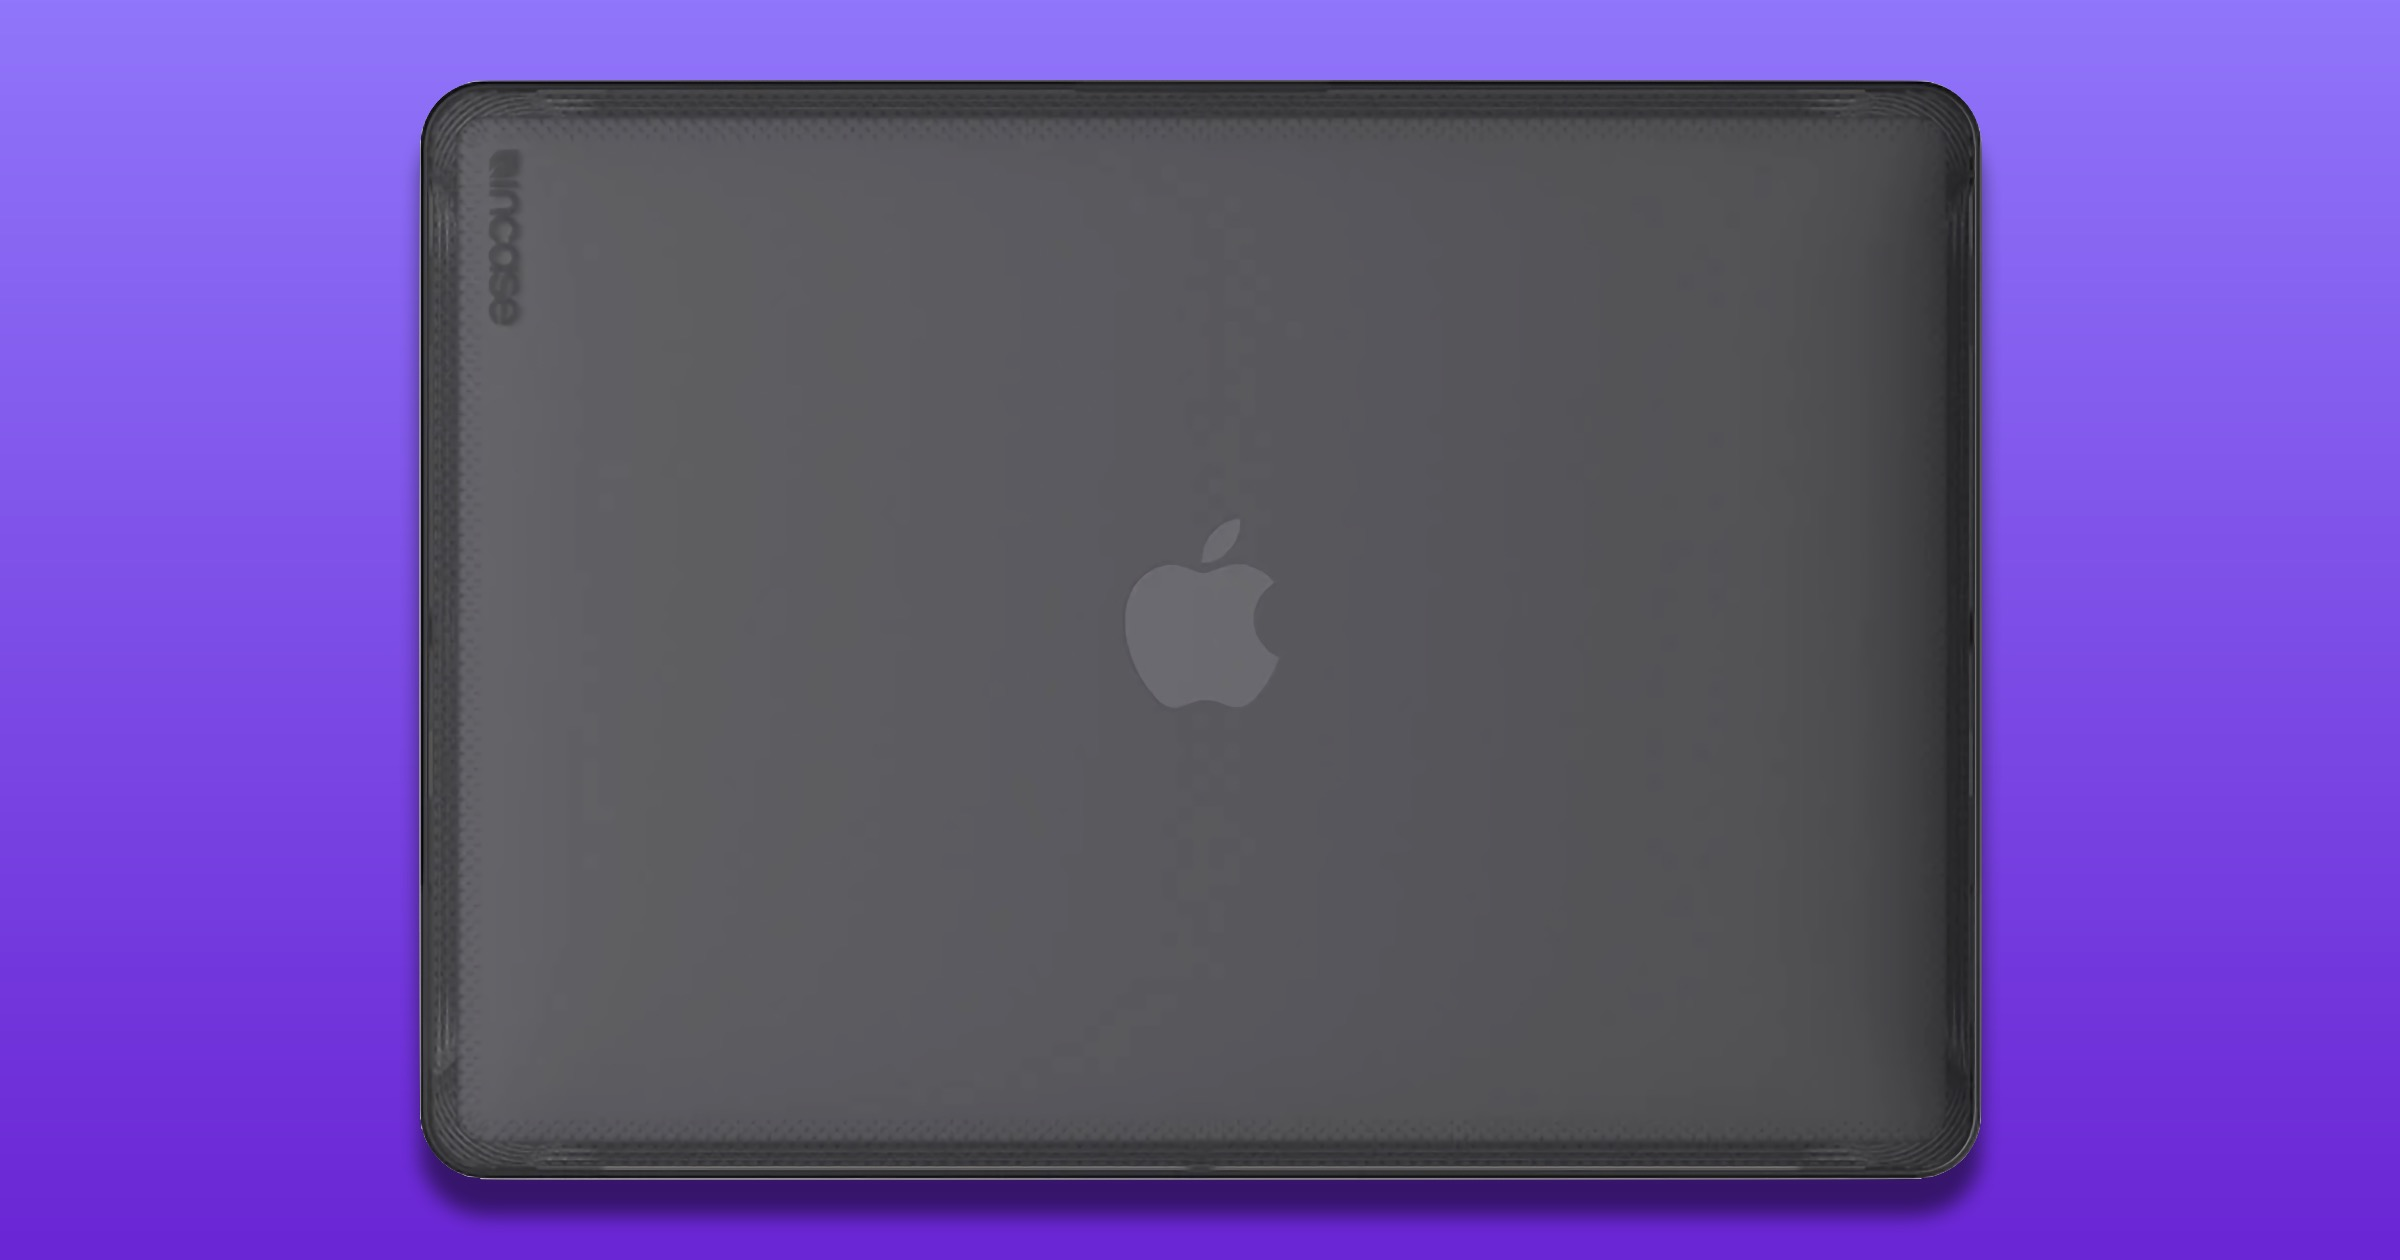 Incase reform hardshell case for MacBook Pro